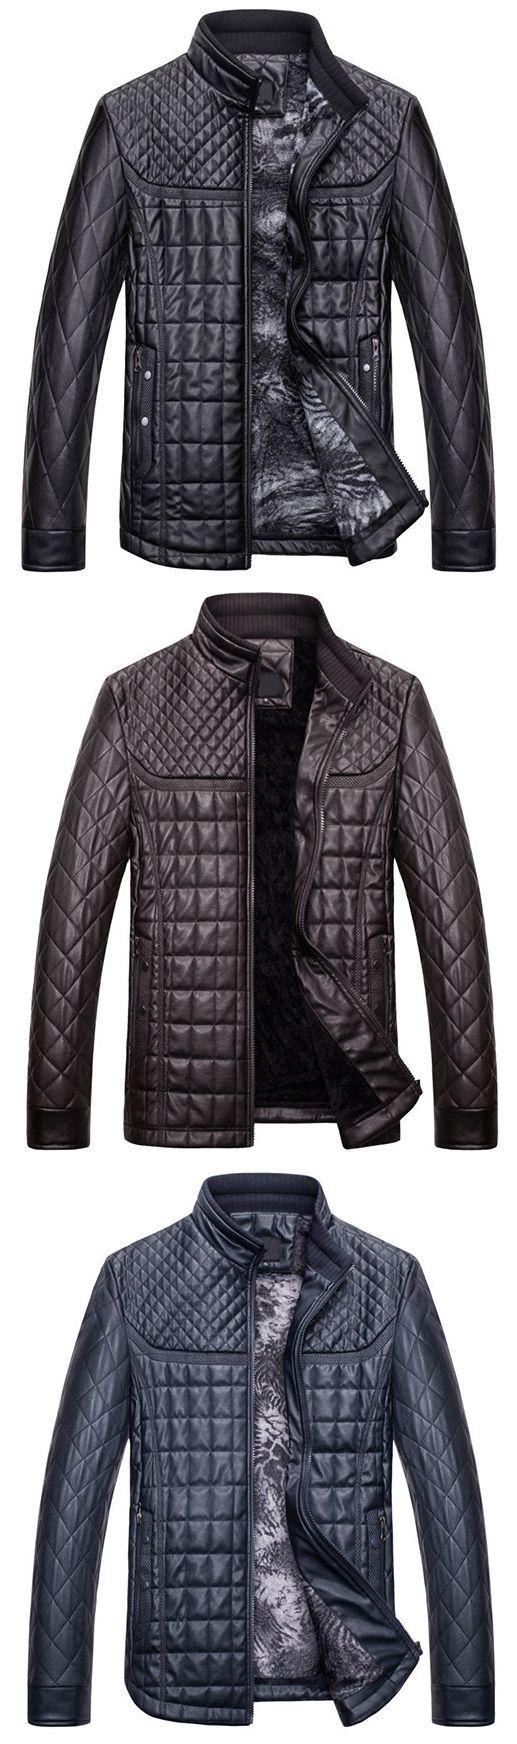 Casual Thicken Fleece Stand Collar Thicken Warm PU Leather